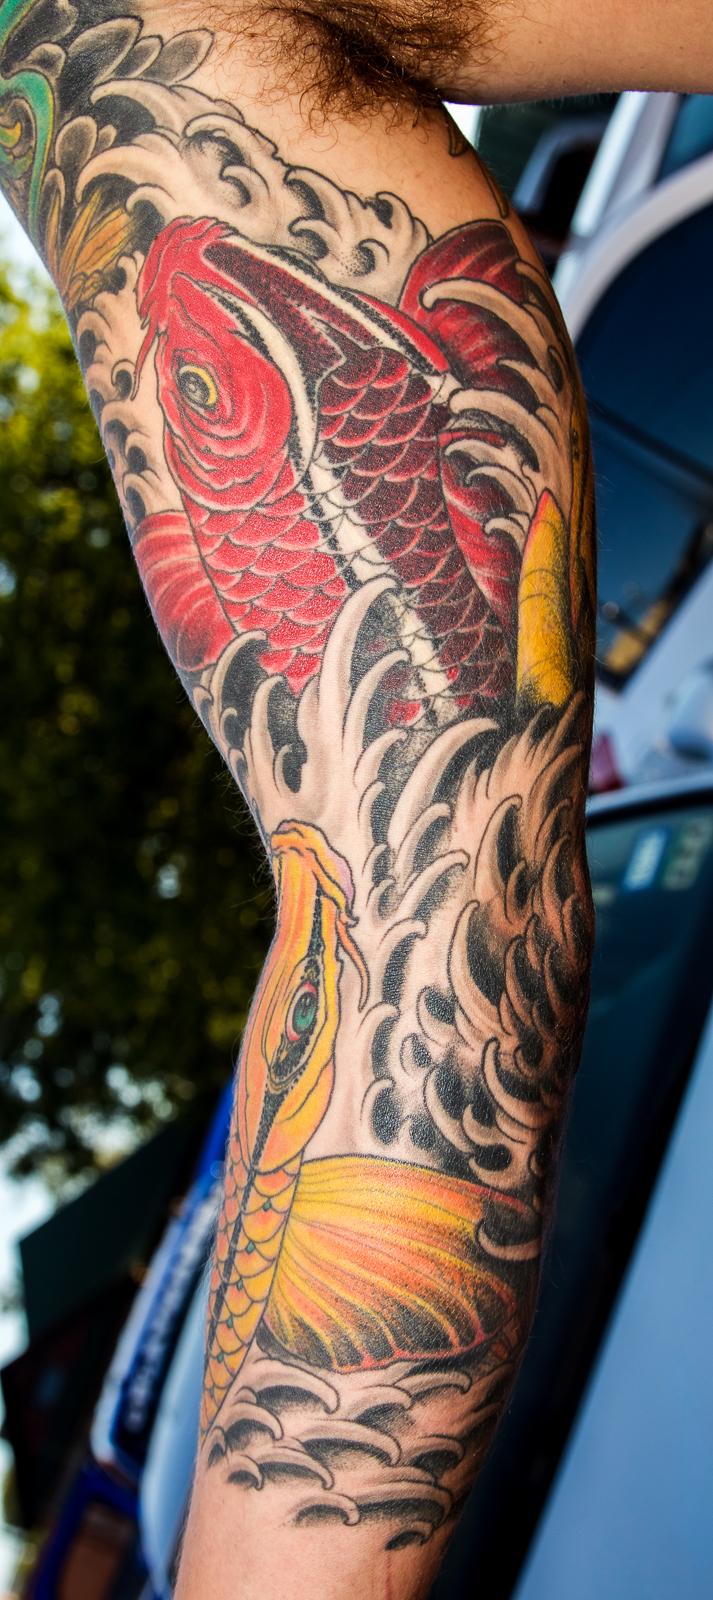 Japanese sleeve 5 enrique bernal ejay tattoo.jpg